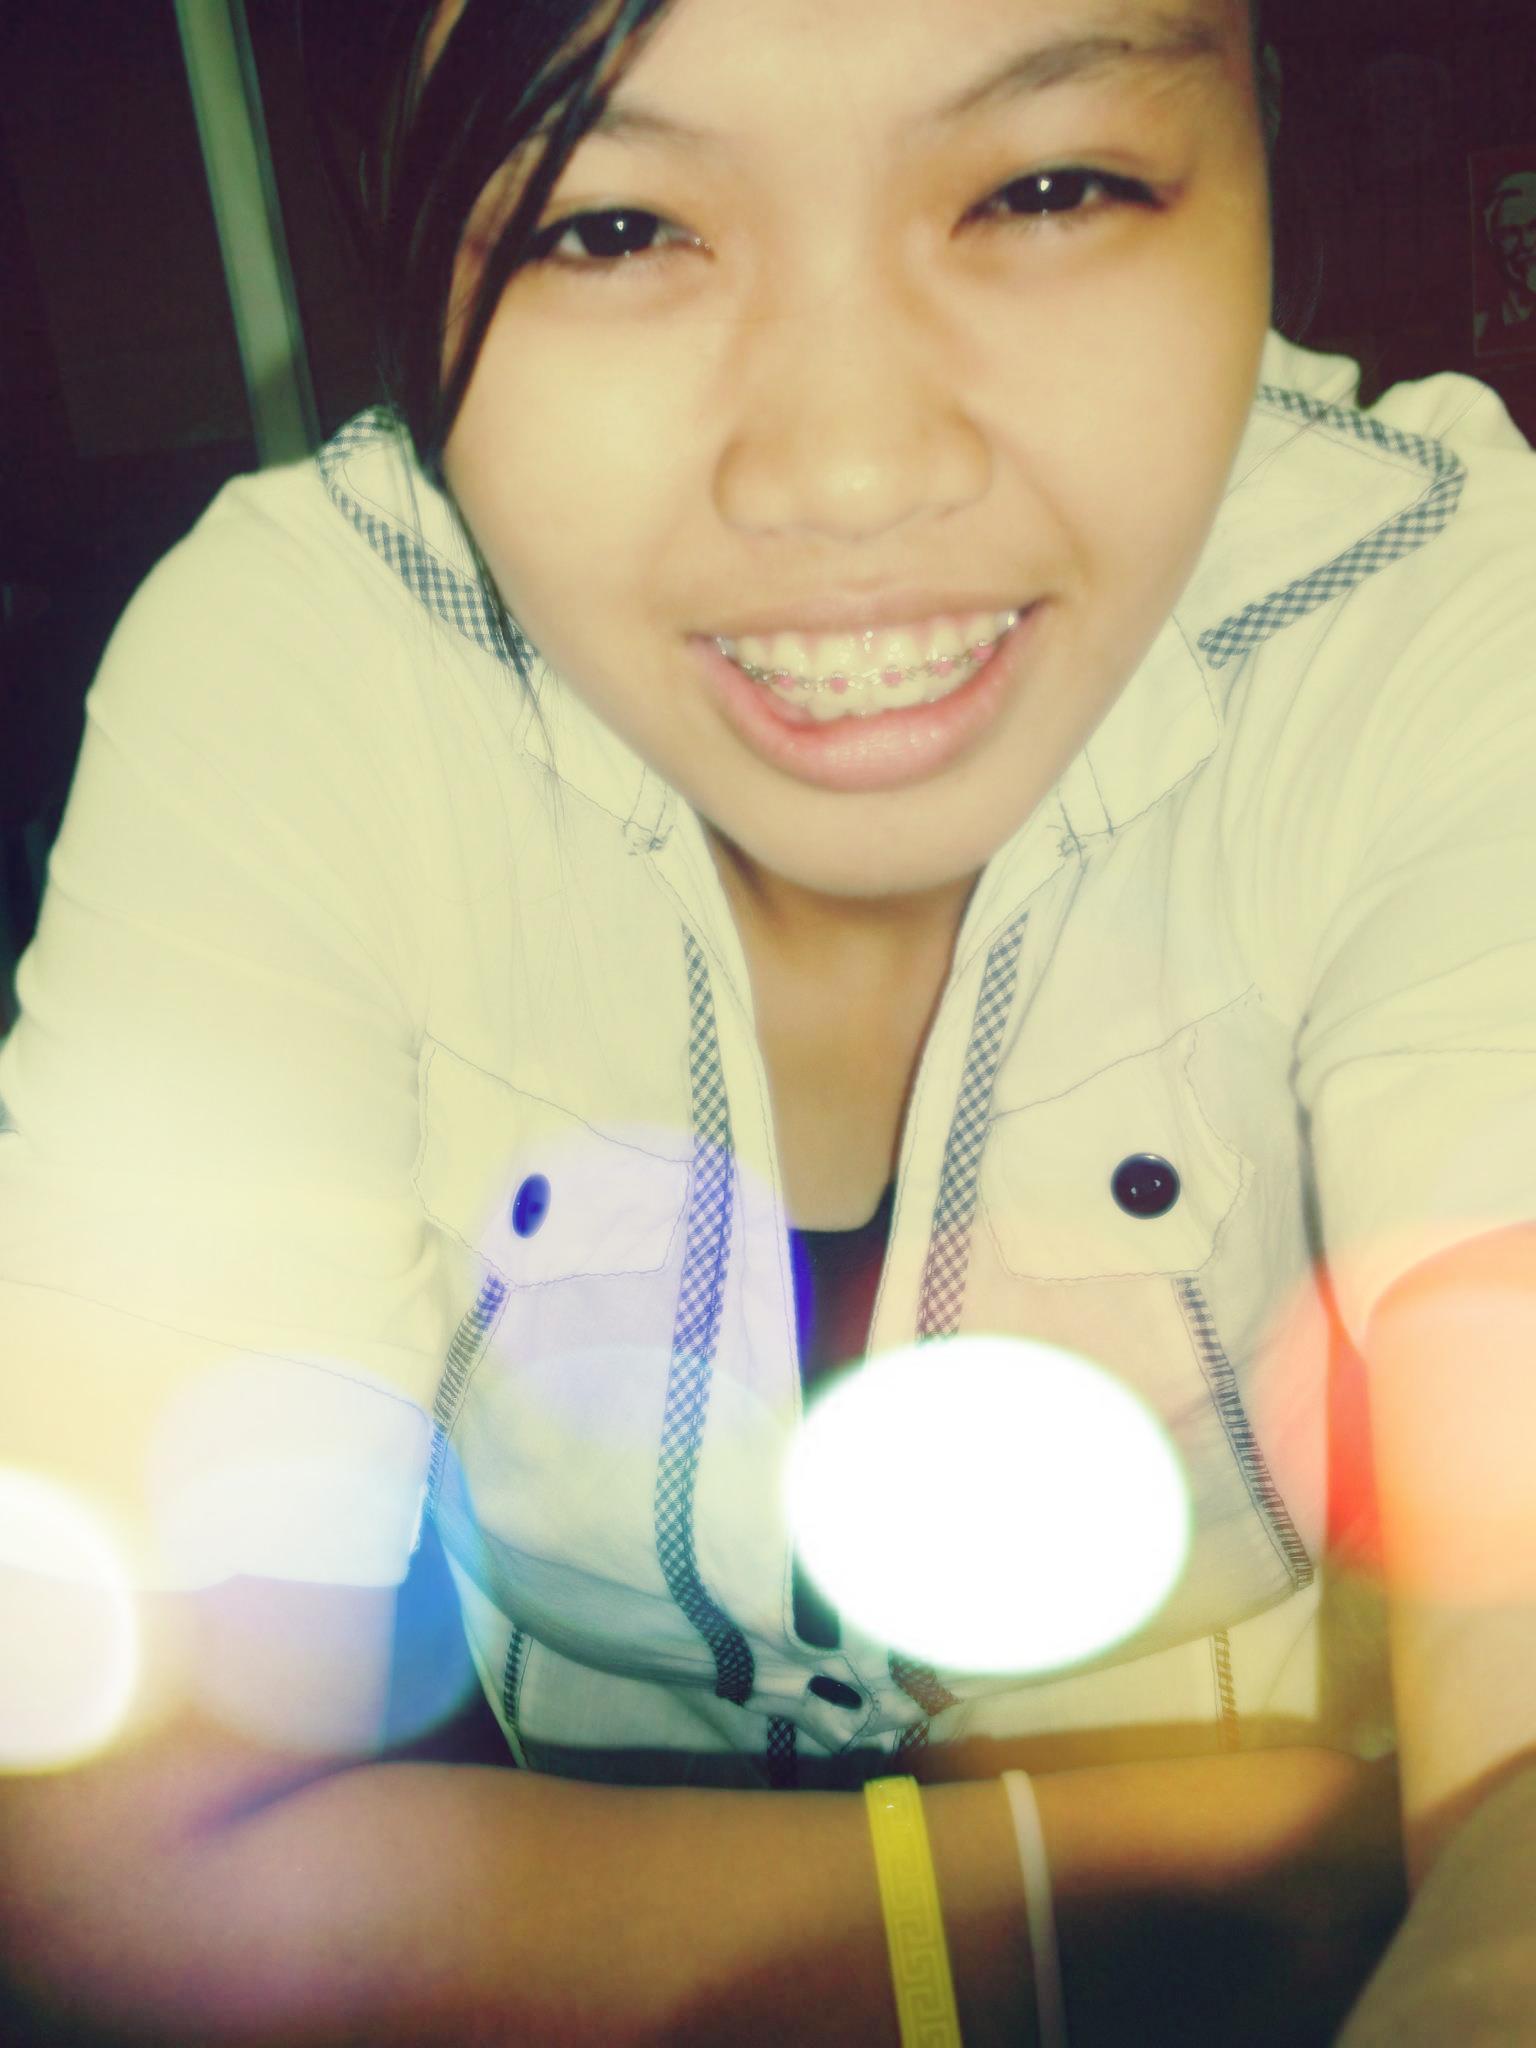 hi hello . haha! im michelle :')) xheL for short ^__^ 19yrs old :))